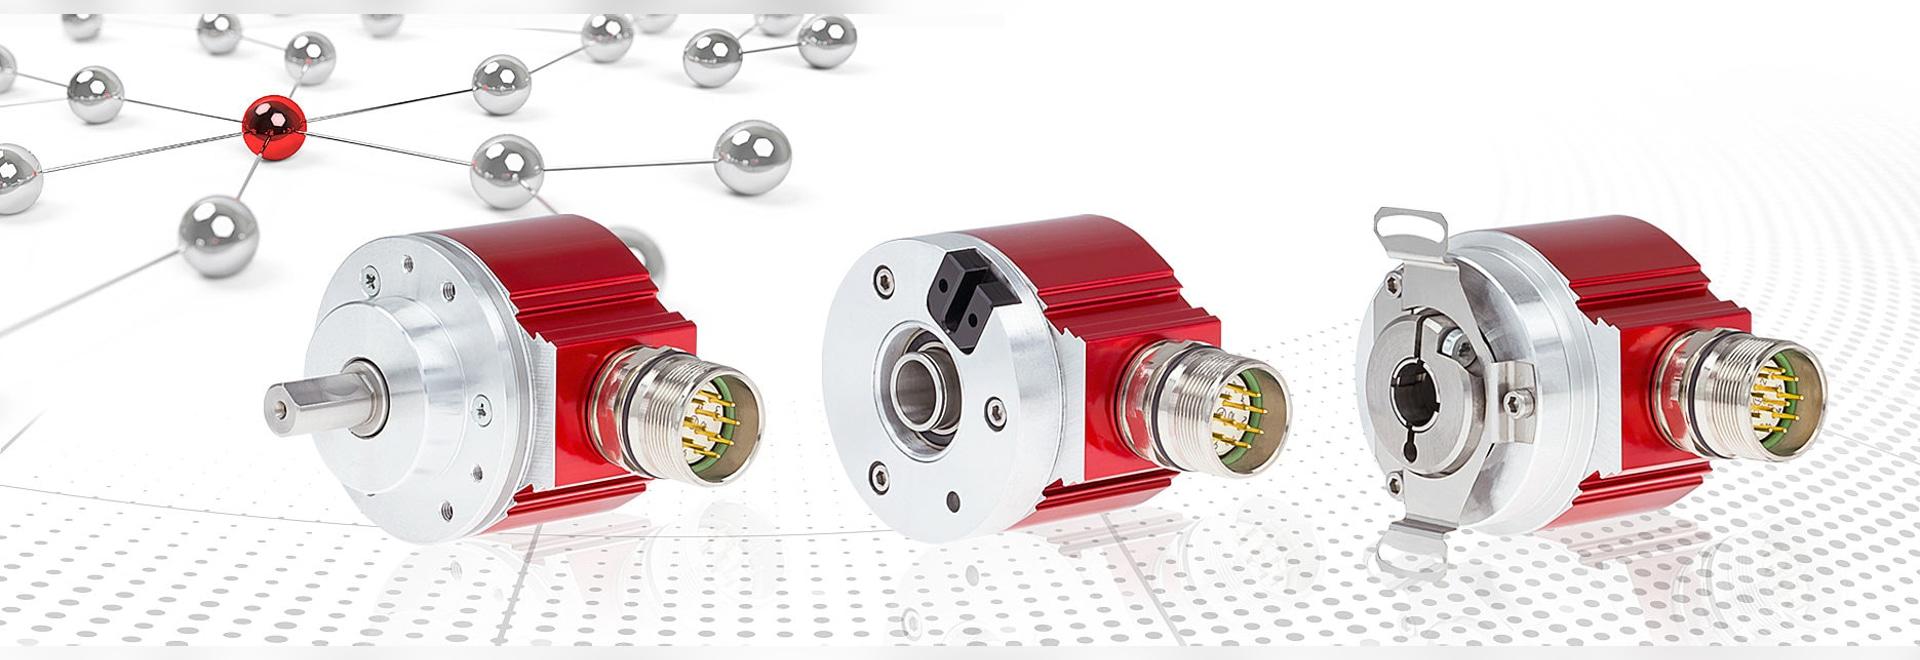 Parameterizable incremental rotary encoders: New generation